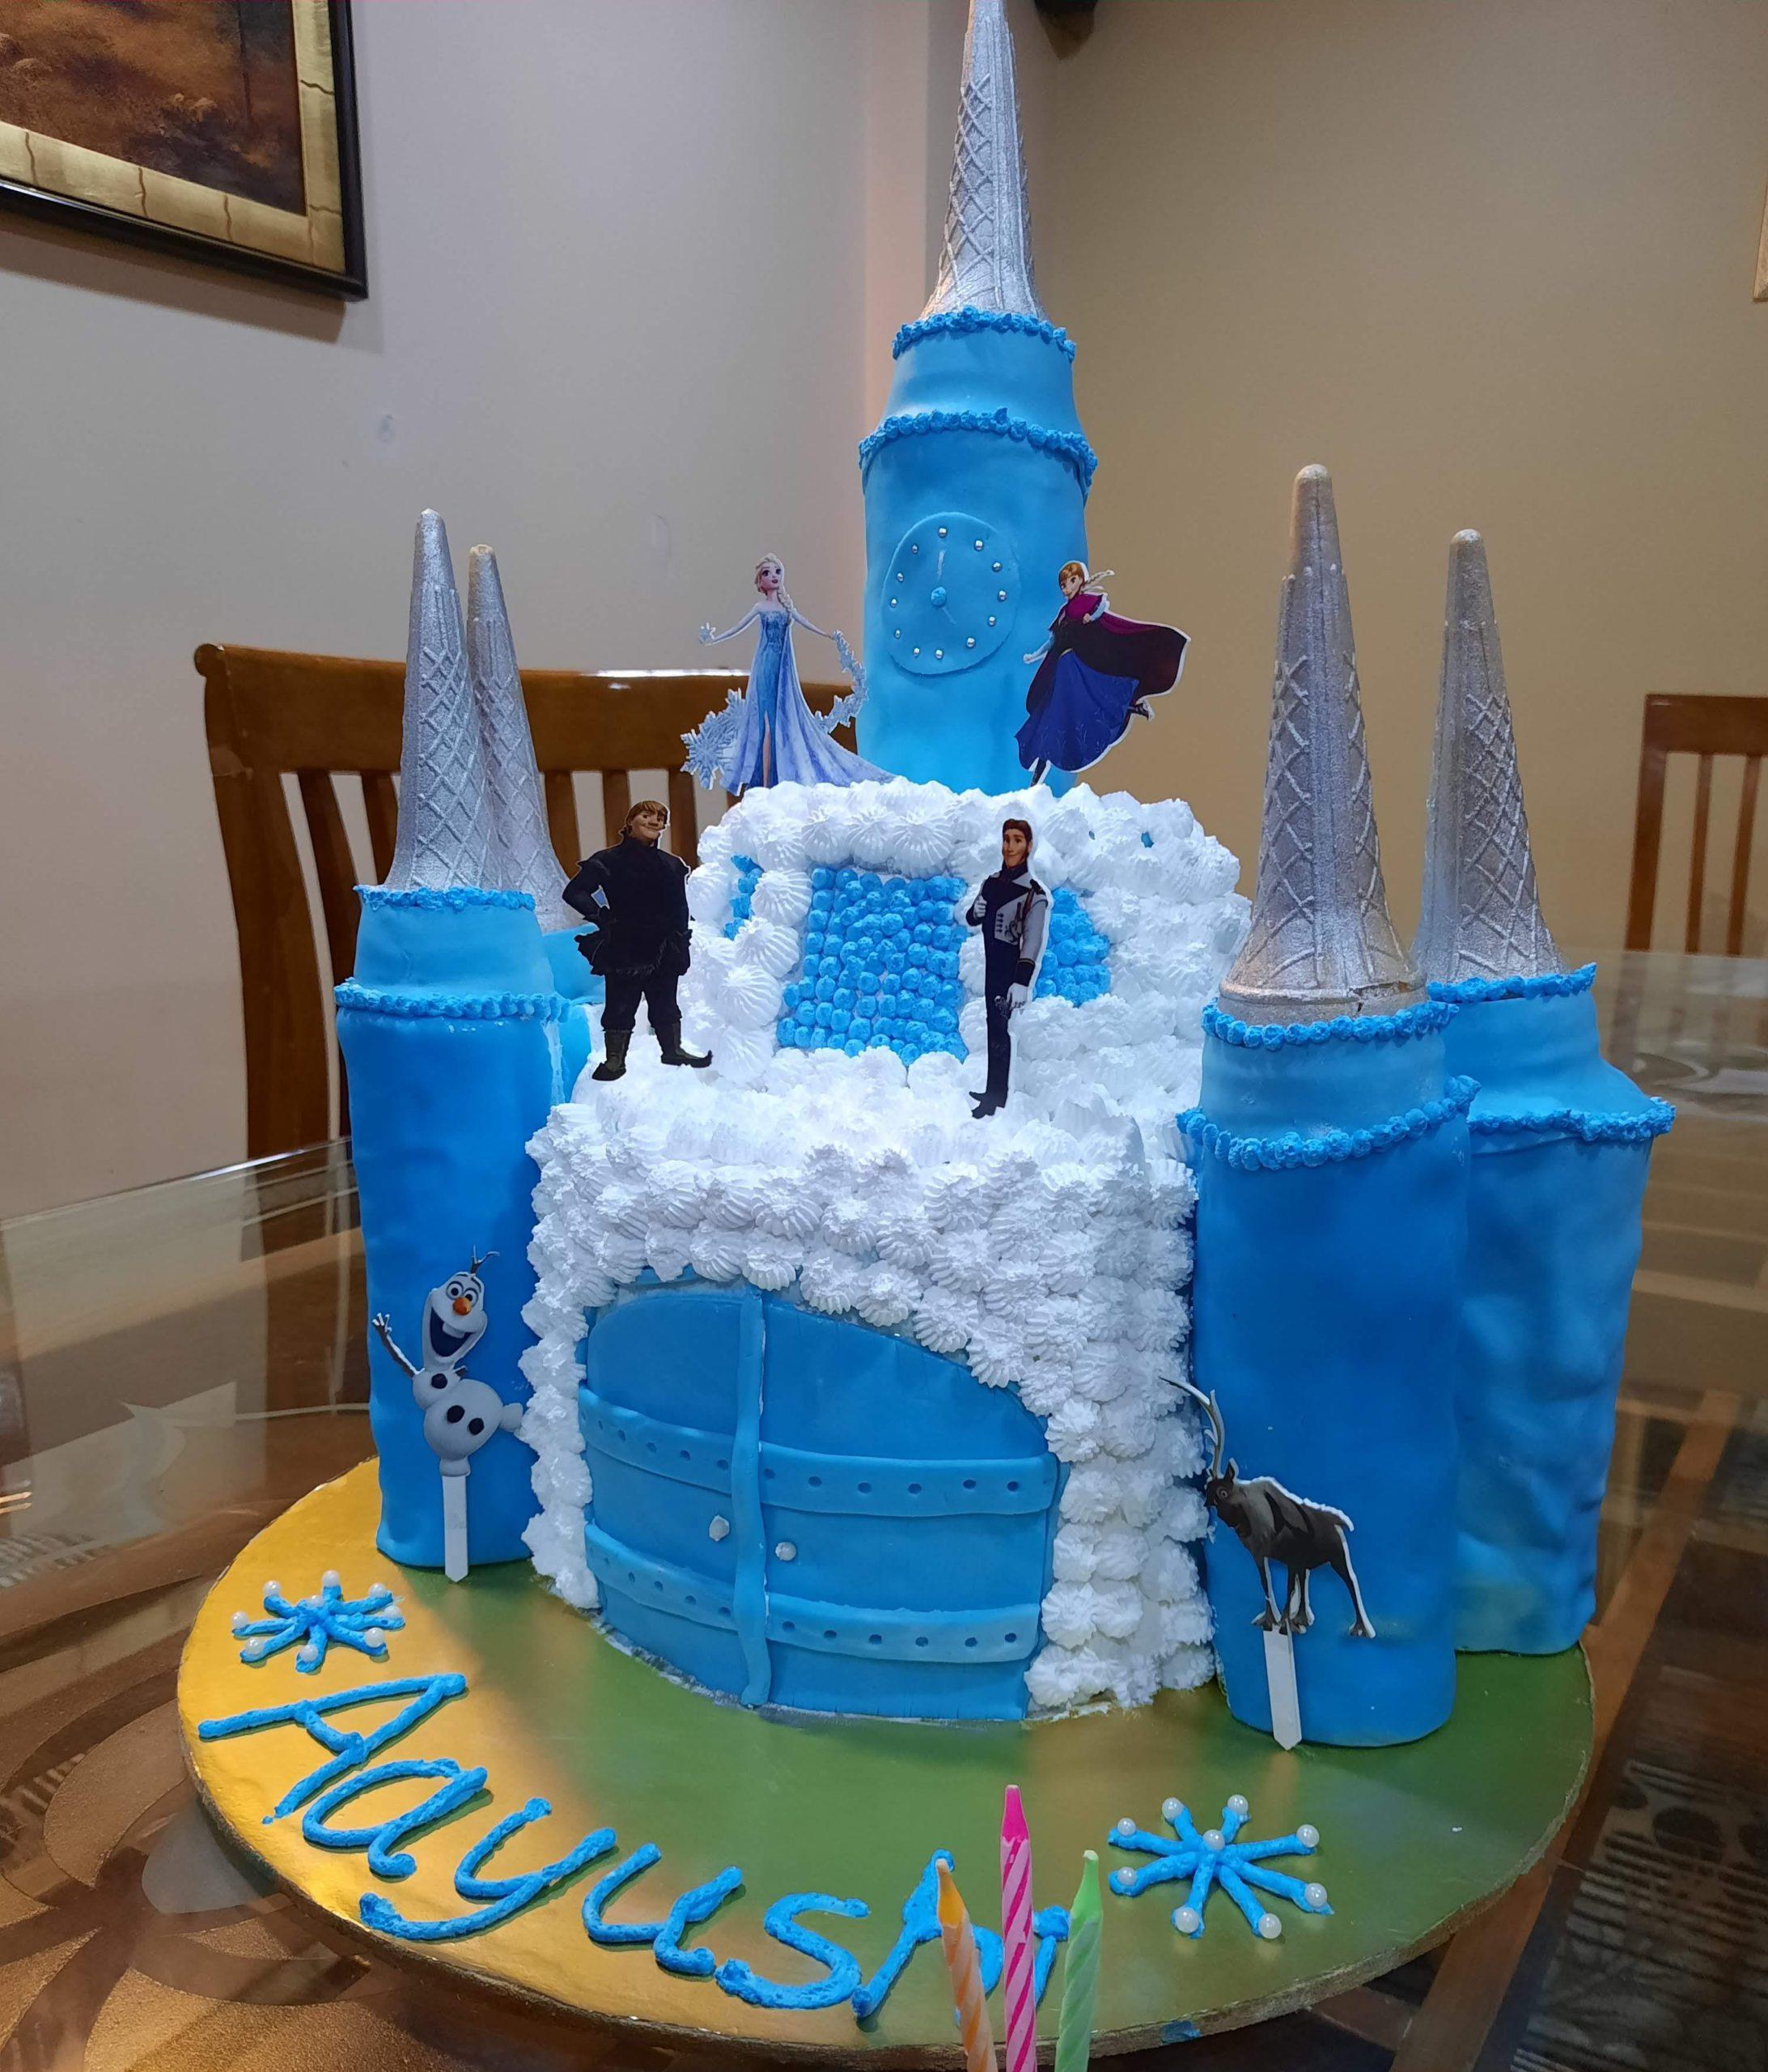 Frozen Castle Themes Cake Blueberry Flavour Designs, Images, Price Near Me